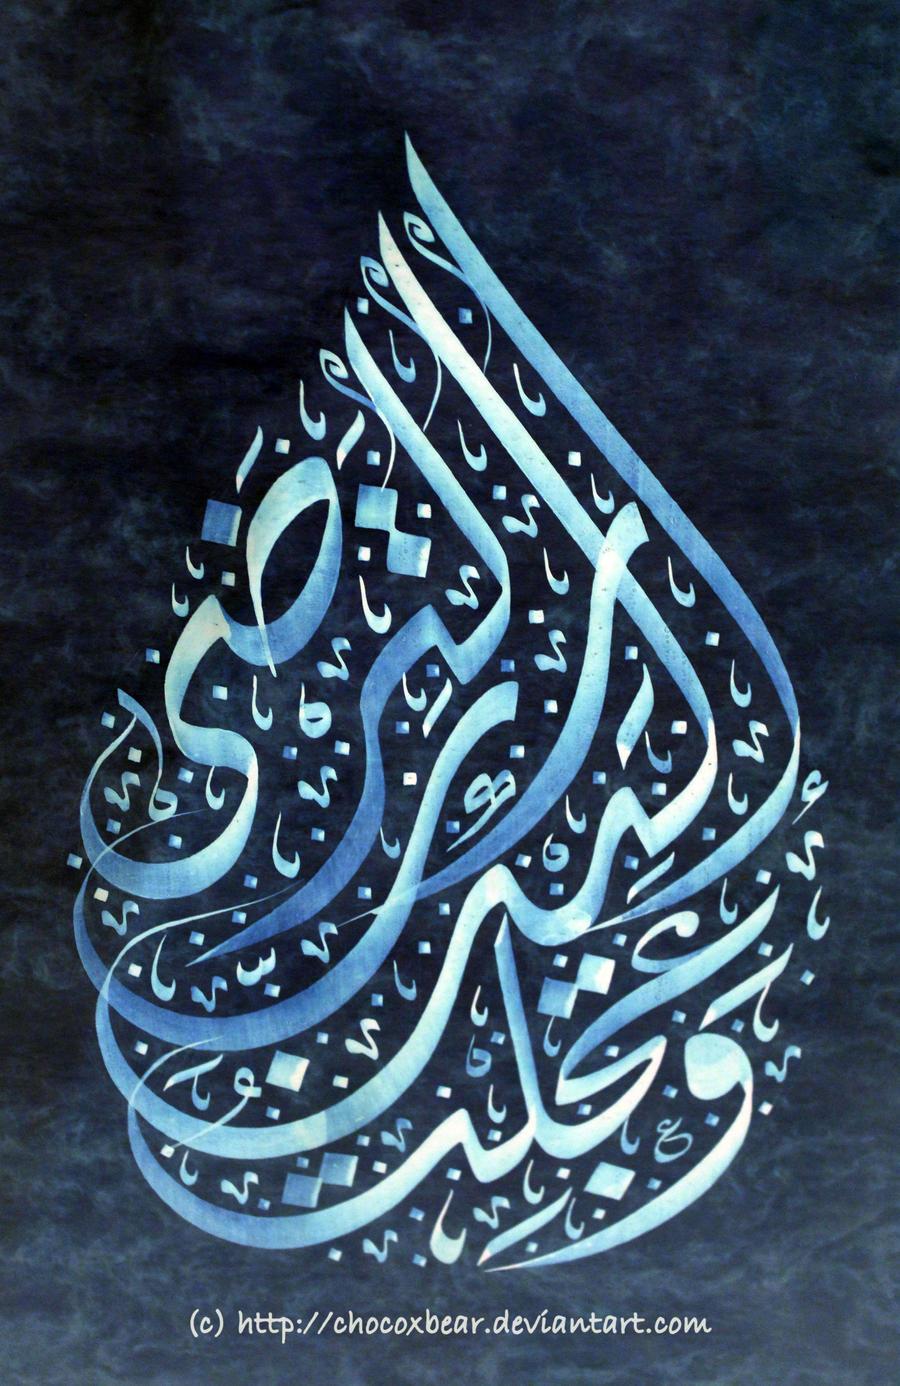 Arabic Calligraphy By Chocoxbear On Deviantart